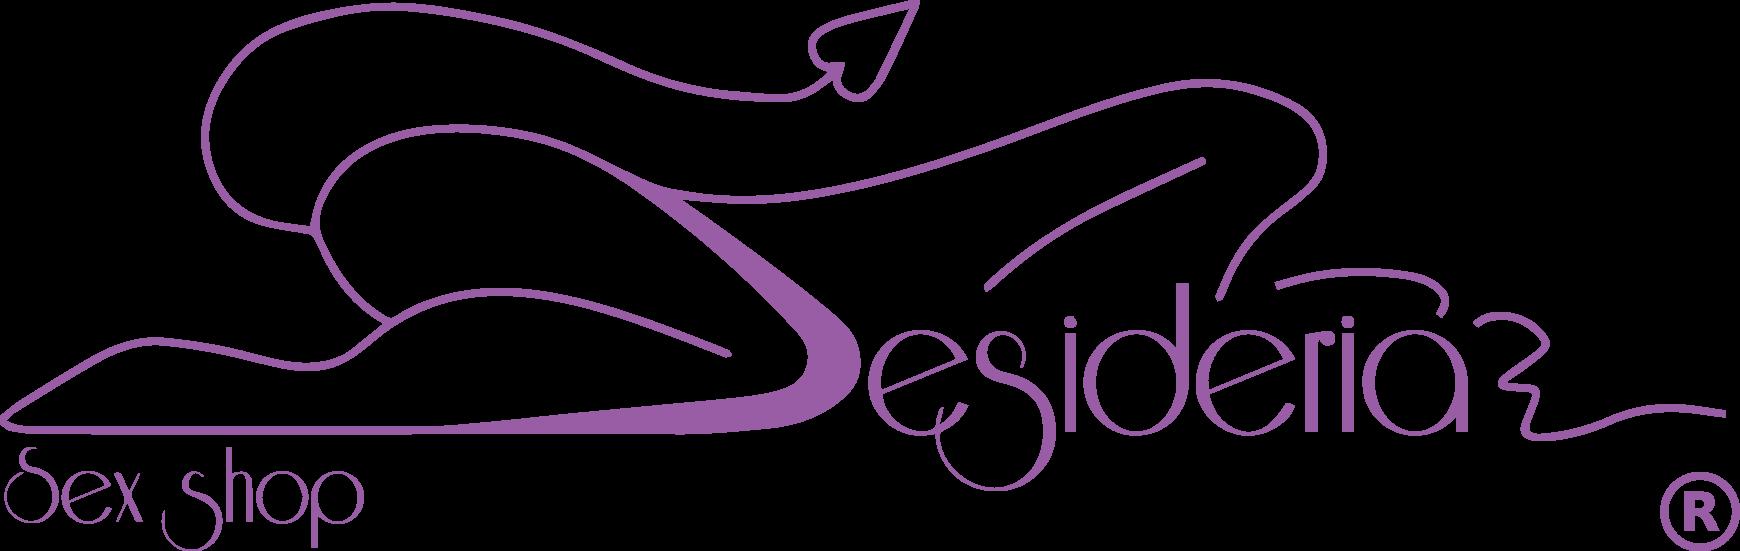 Desideria Sex Shop